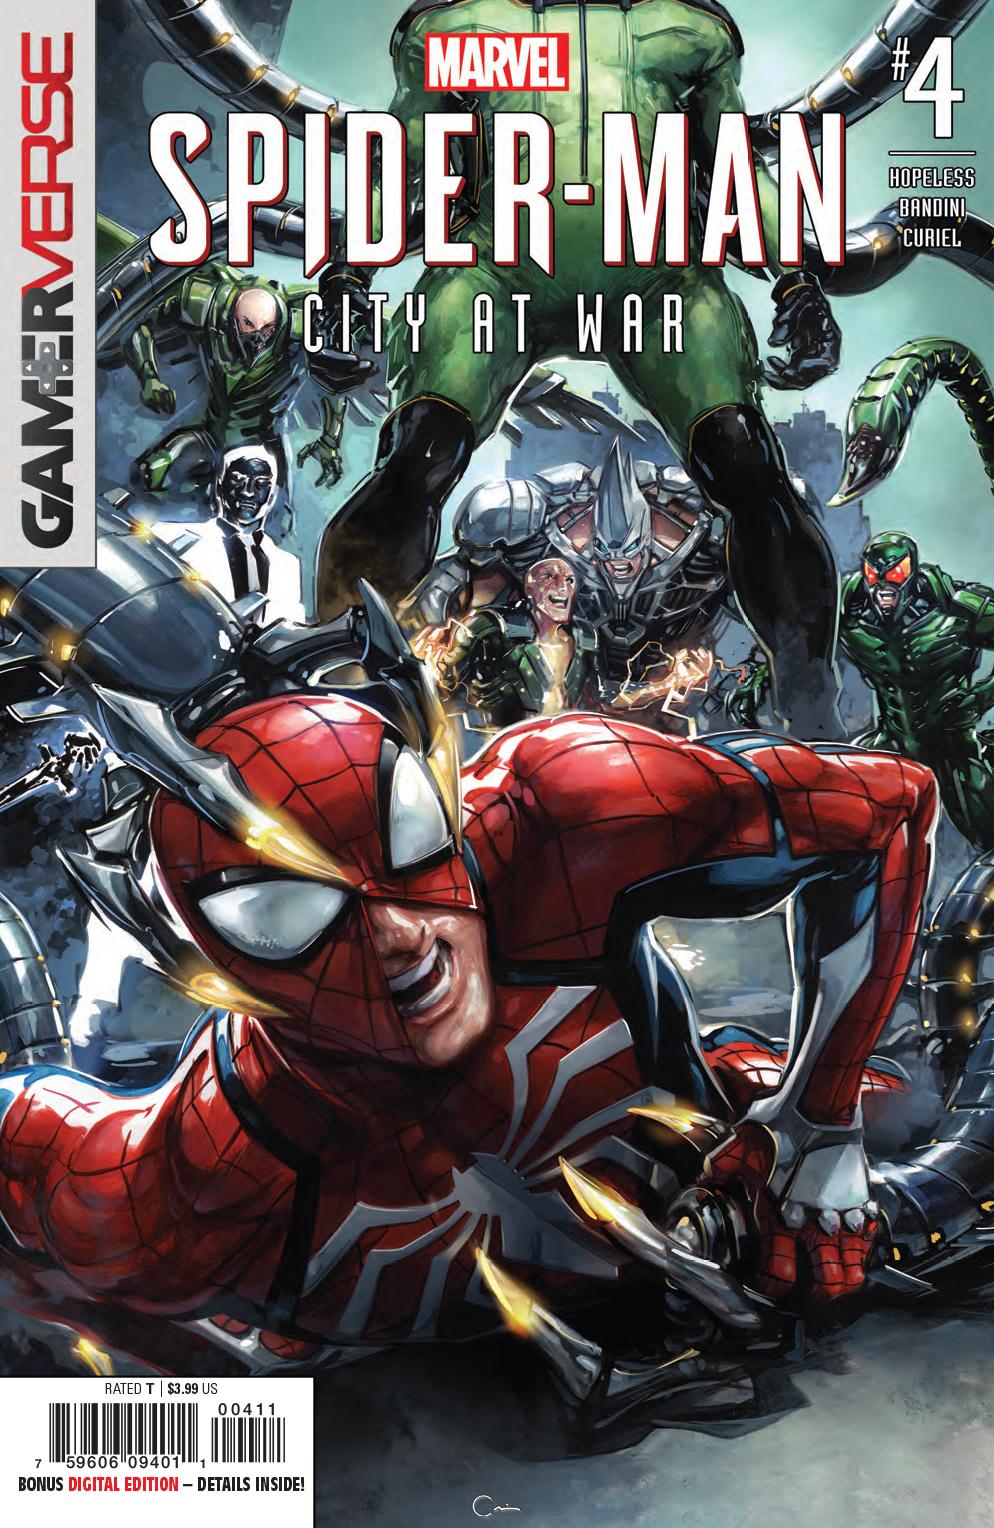 APR190834 - SPIDER-MAN CITY AT WAR #4 (OF 6) - Previews World